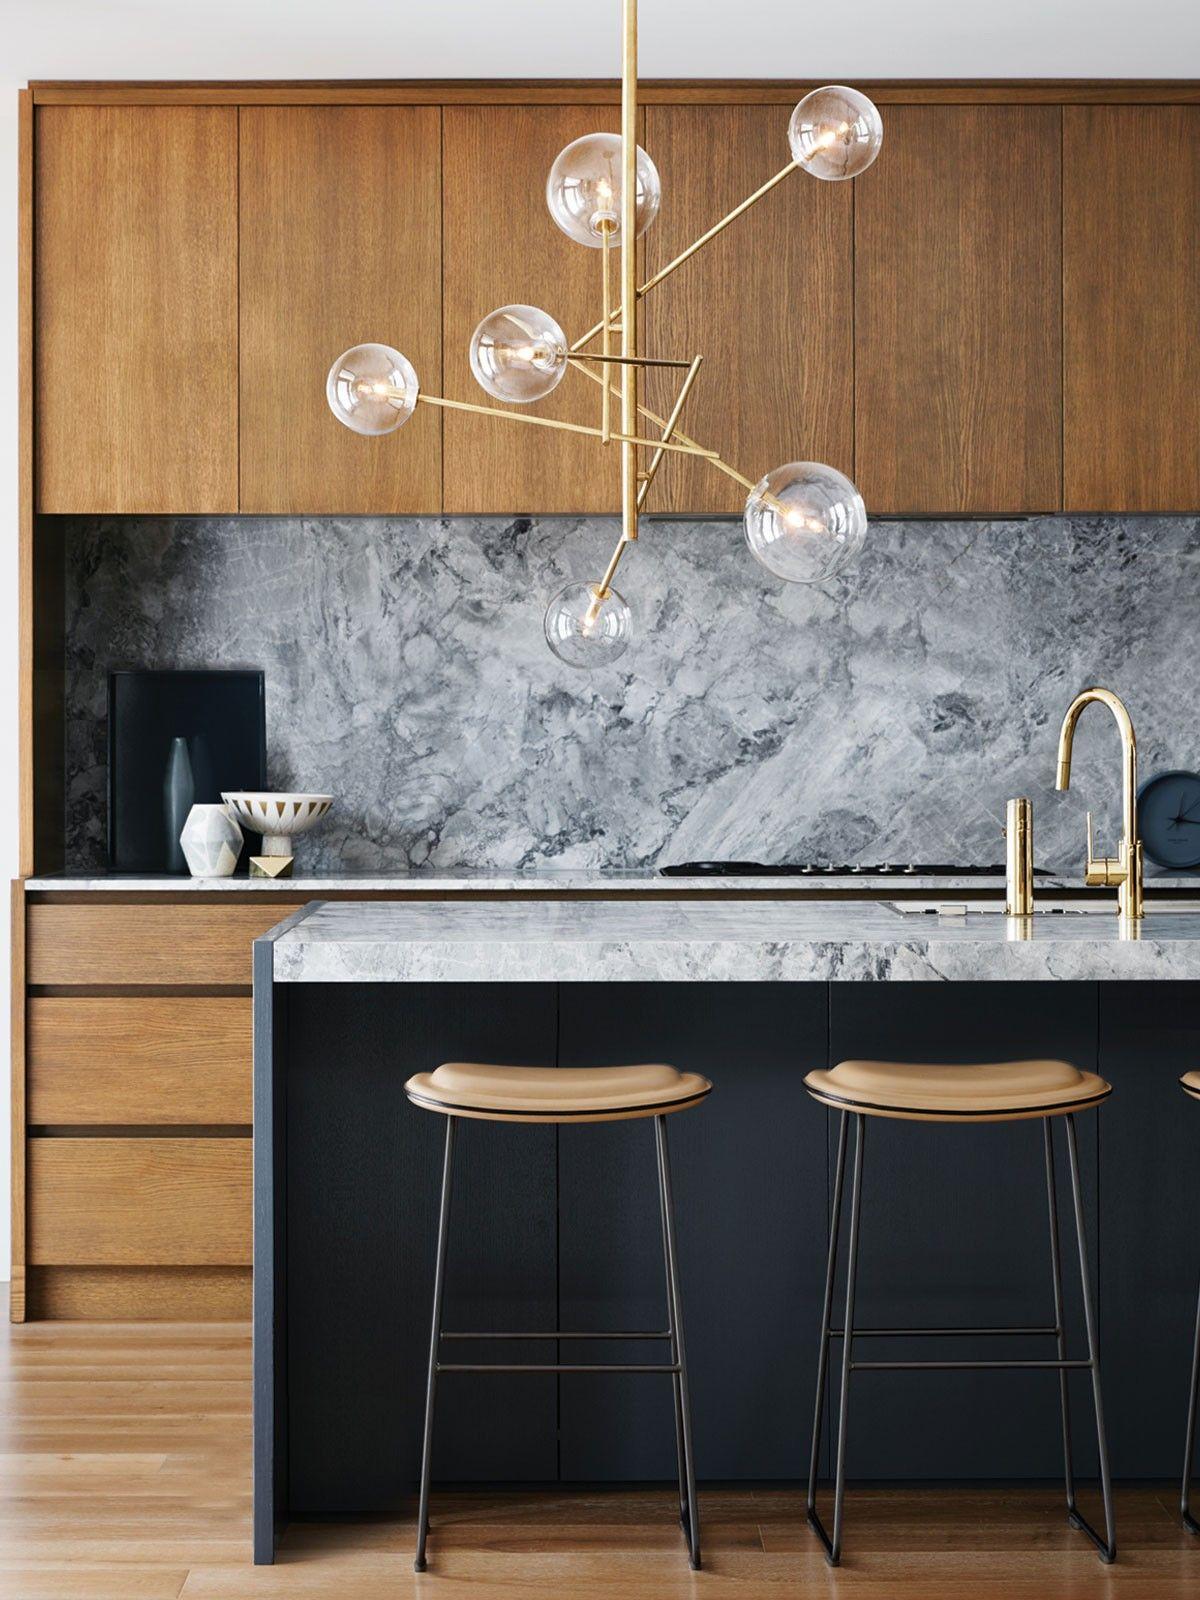 Yay or nay: houten keukens - Alles om van je huis je Thuis te maken | HomeDeco.nl